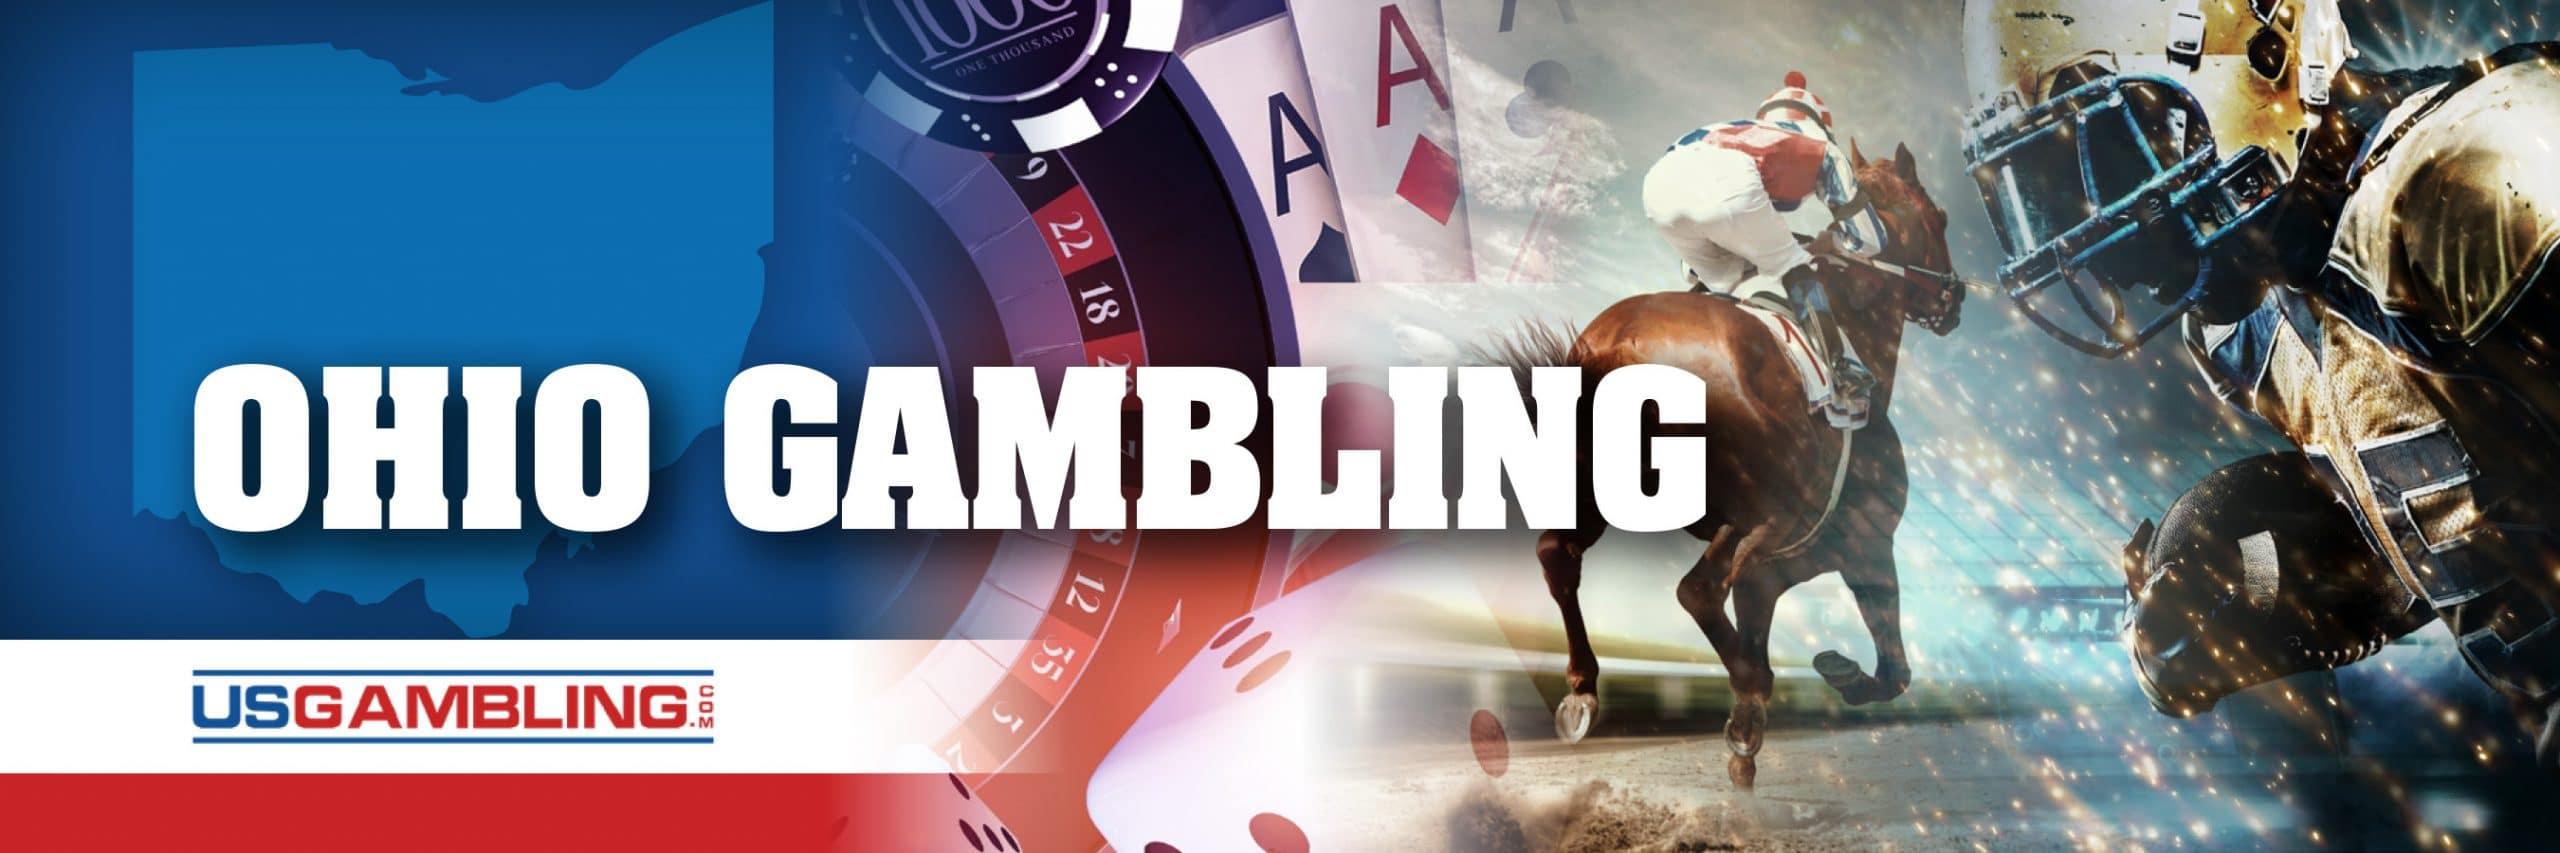 Legal Ohio Gambling